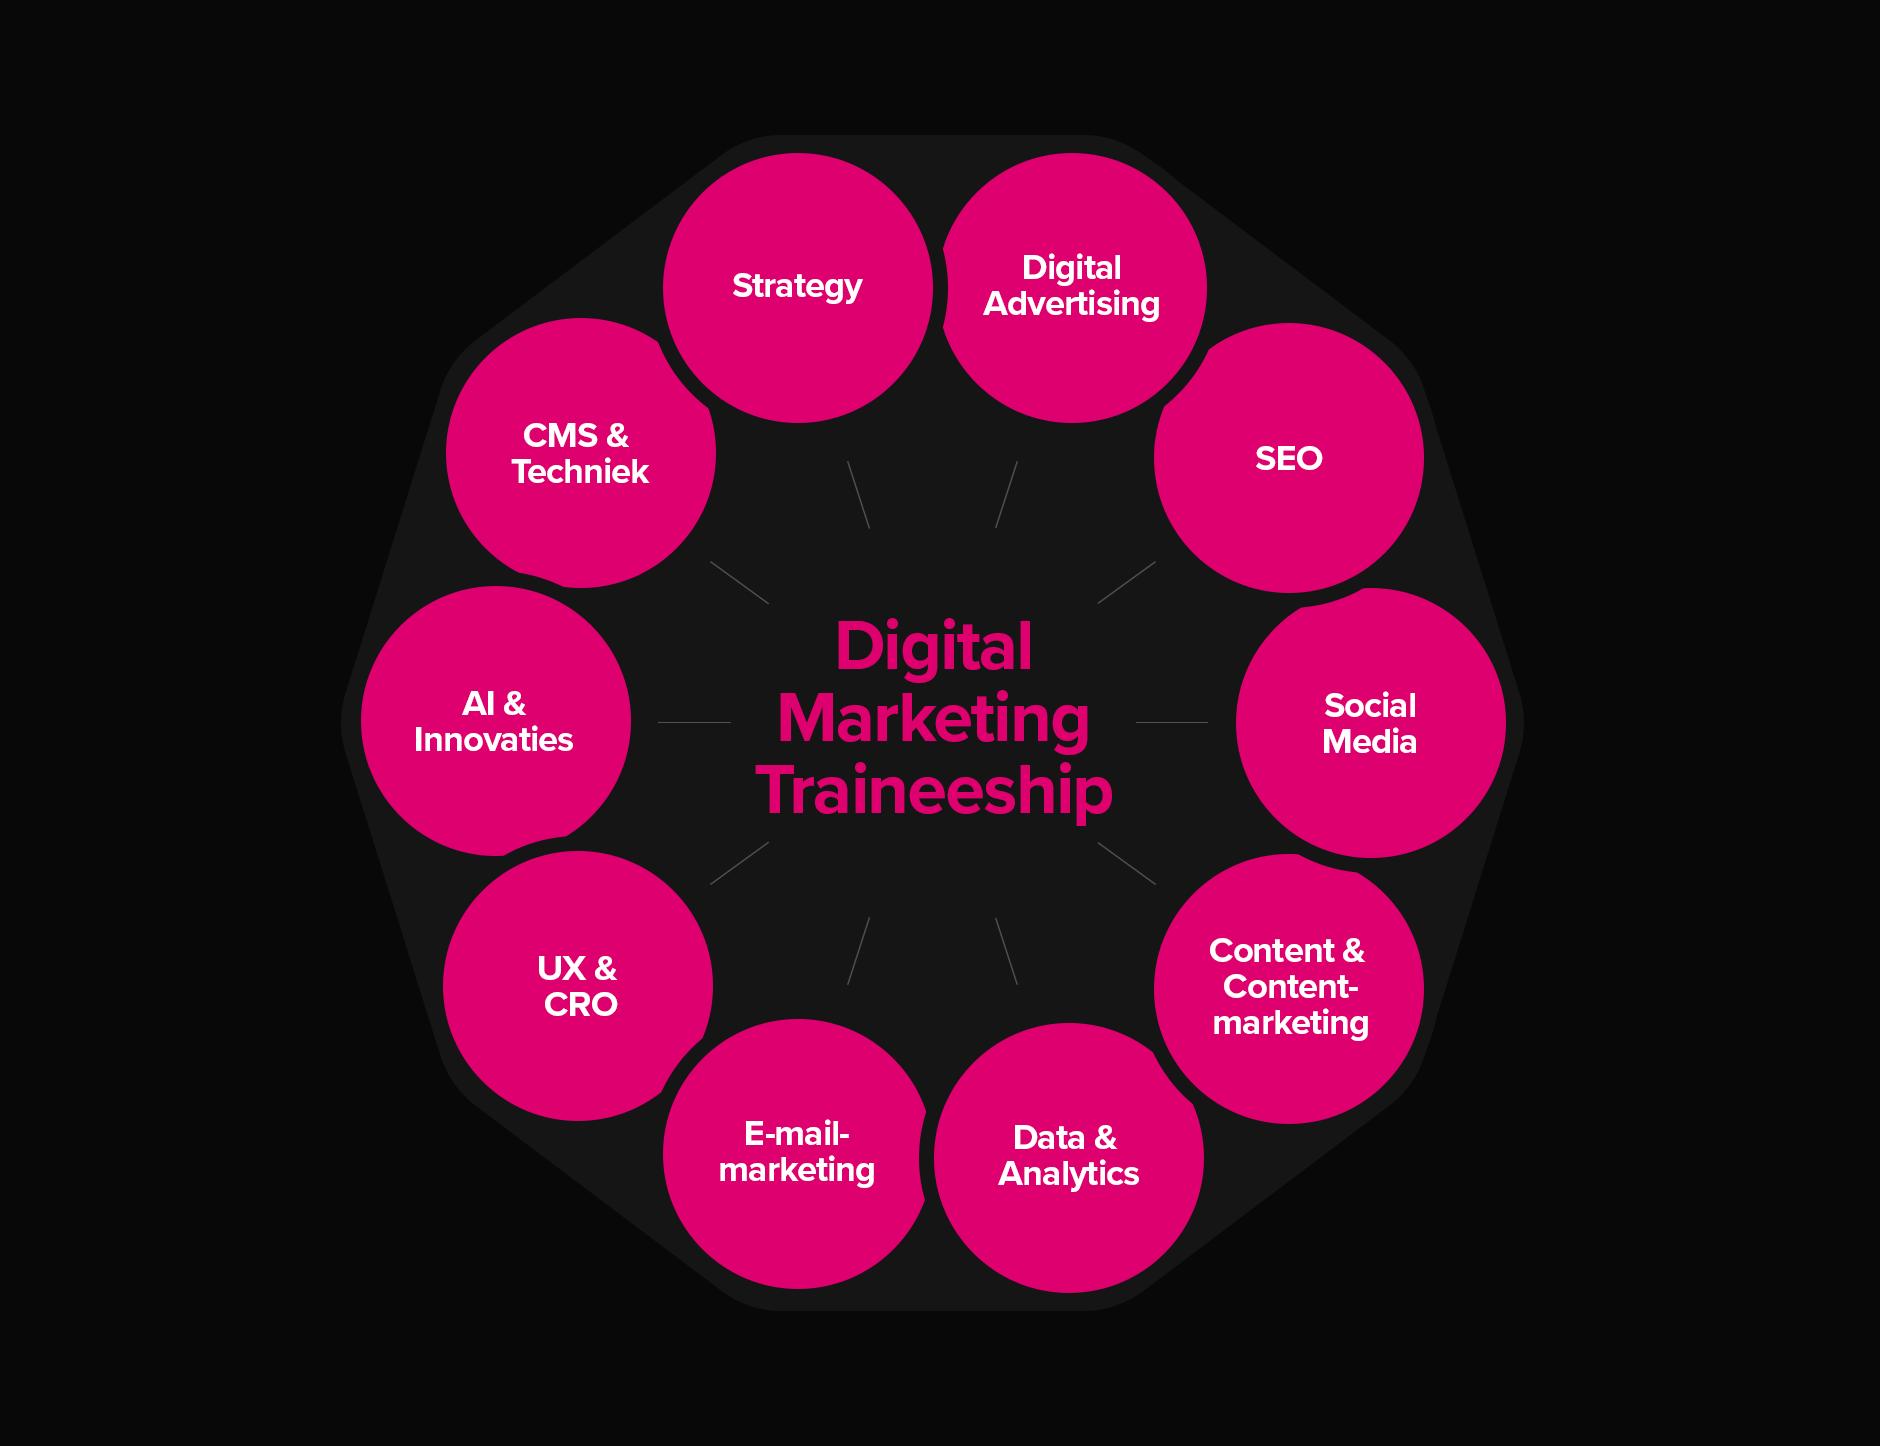 Adwise Digital Marketing traineeship